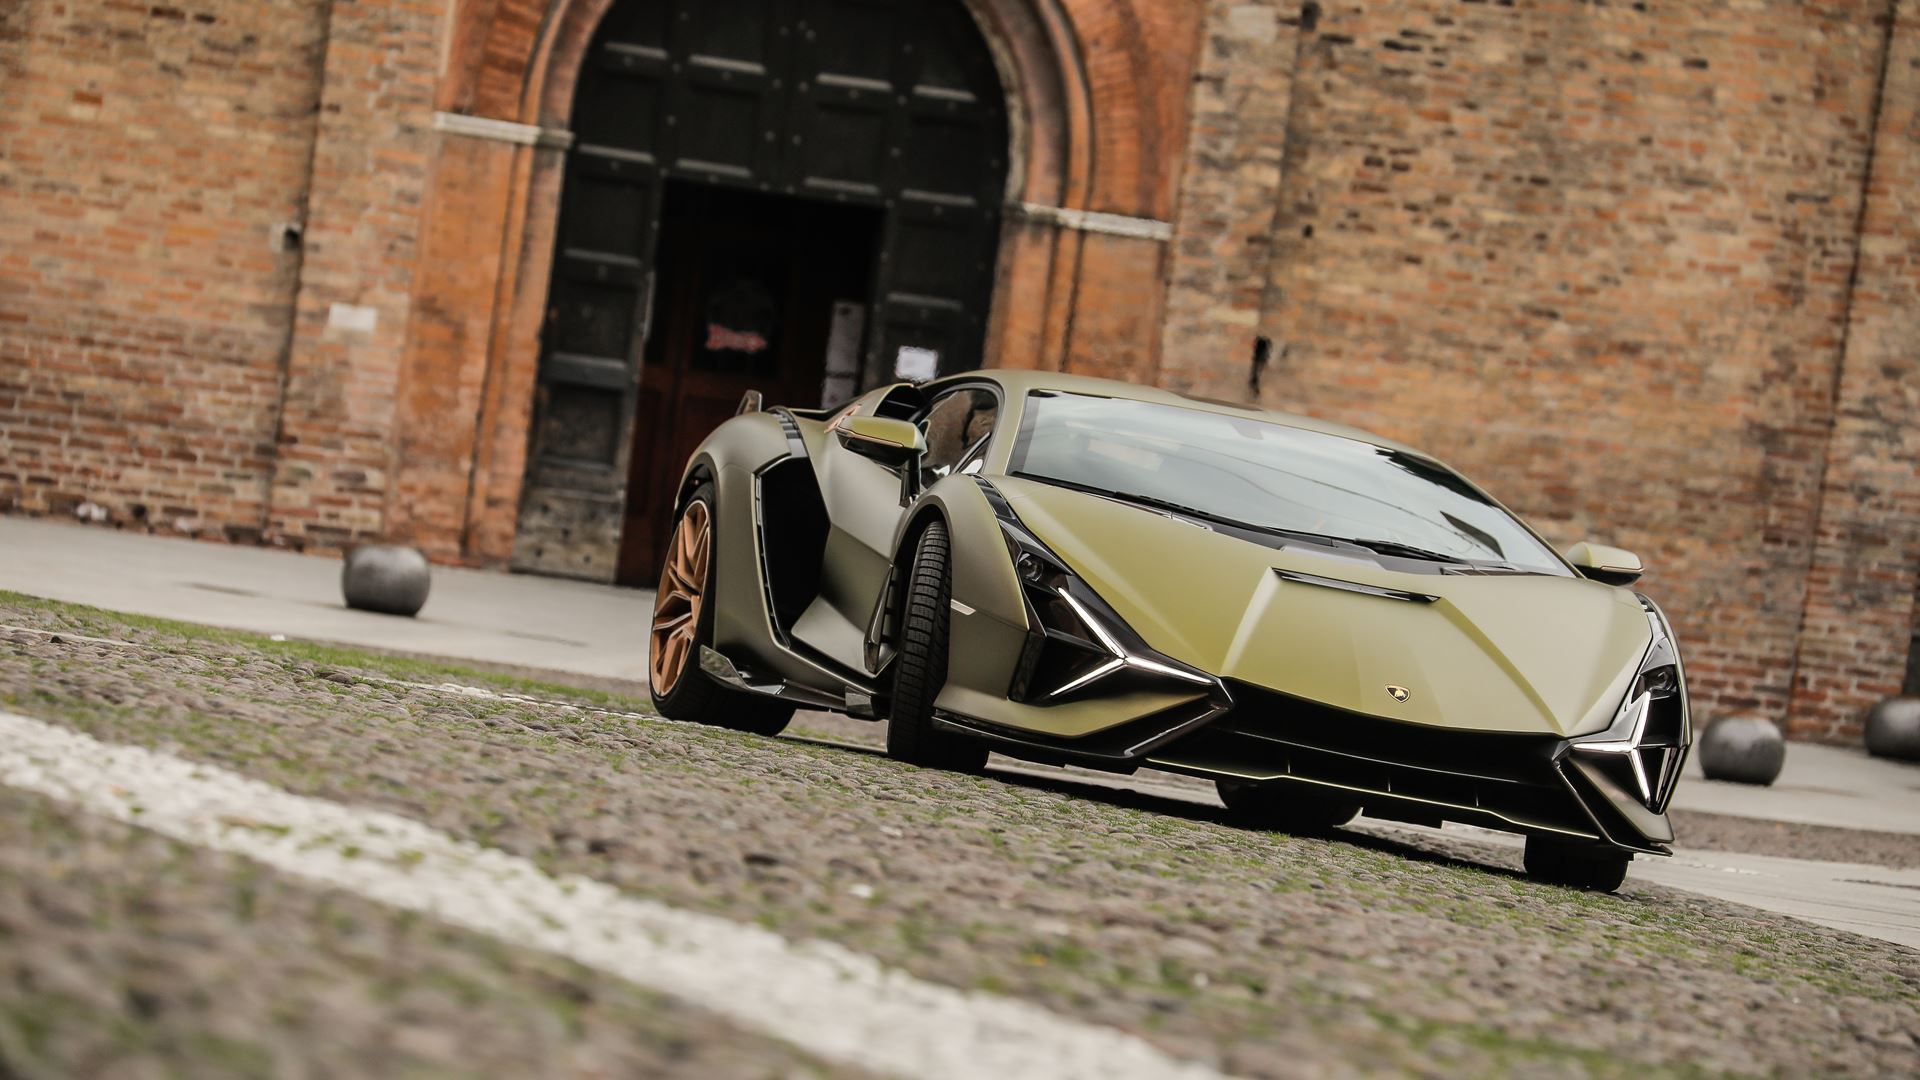 Automobili Lamborghini builds dream cars, also with LEGO® Technic™ - Life-size Lamborghini Sián FKP 37 created from over 400,000 LEGO® elements - Image 6